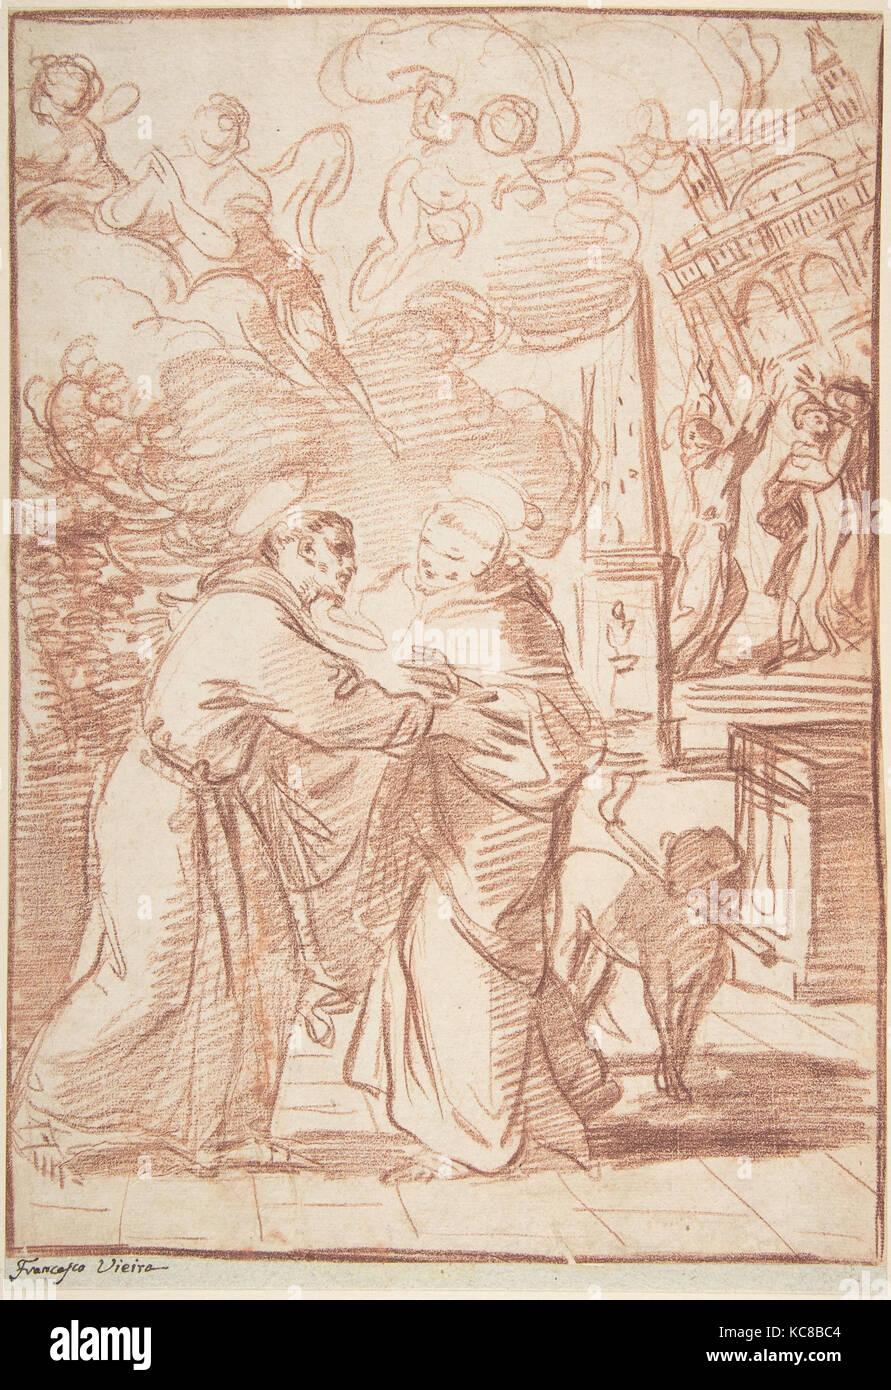 Saint Francis Meeting Saint Dominic, Francisco Vieira de Mattos, 1699–1783 - Stock Image